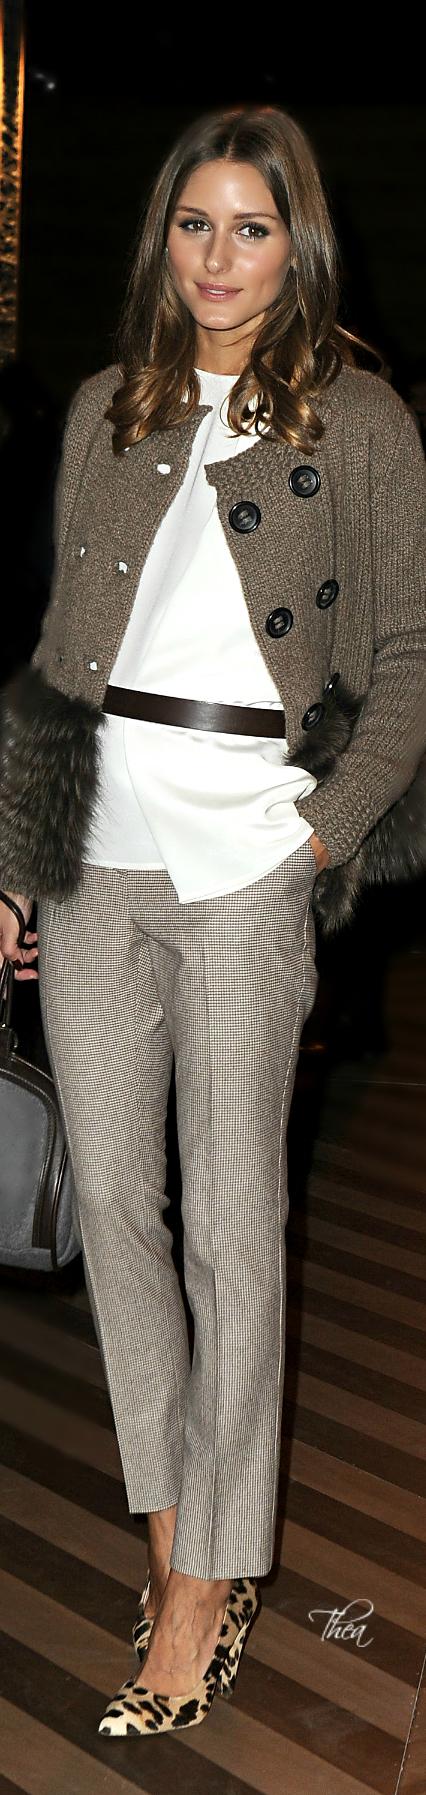 Casual chic. Olivia Palerno via @theatoria, #whiteshirt #OliviaPalerno